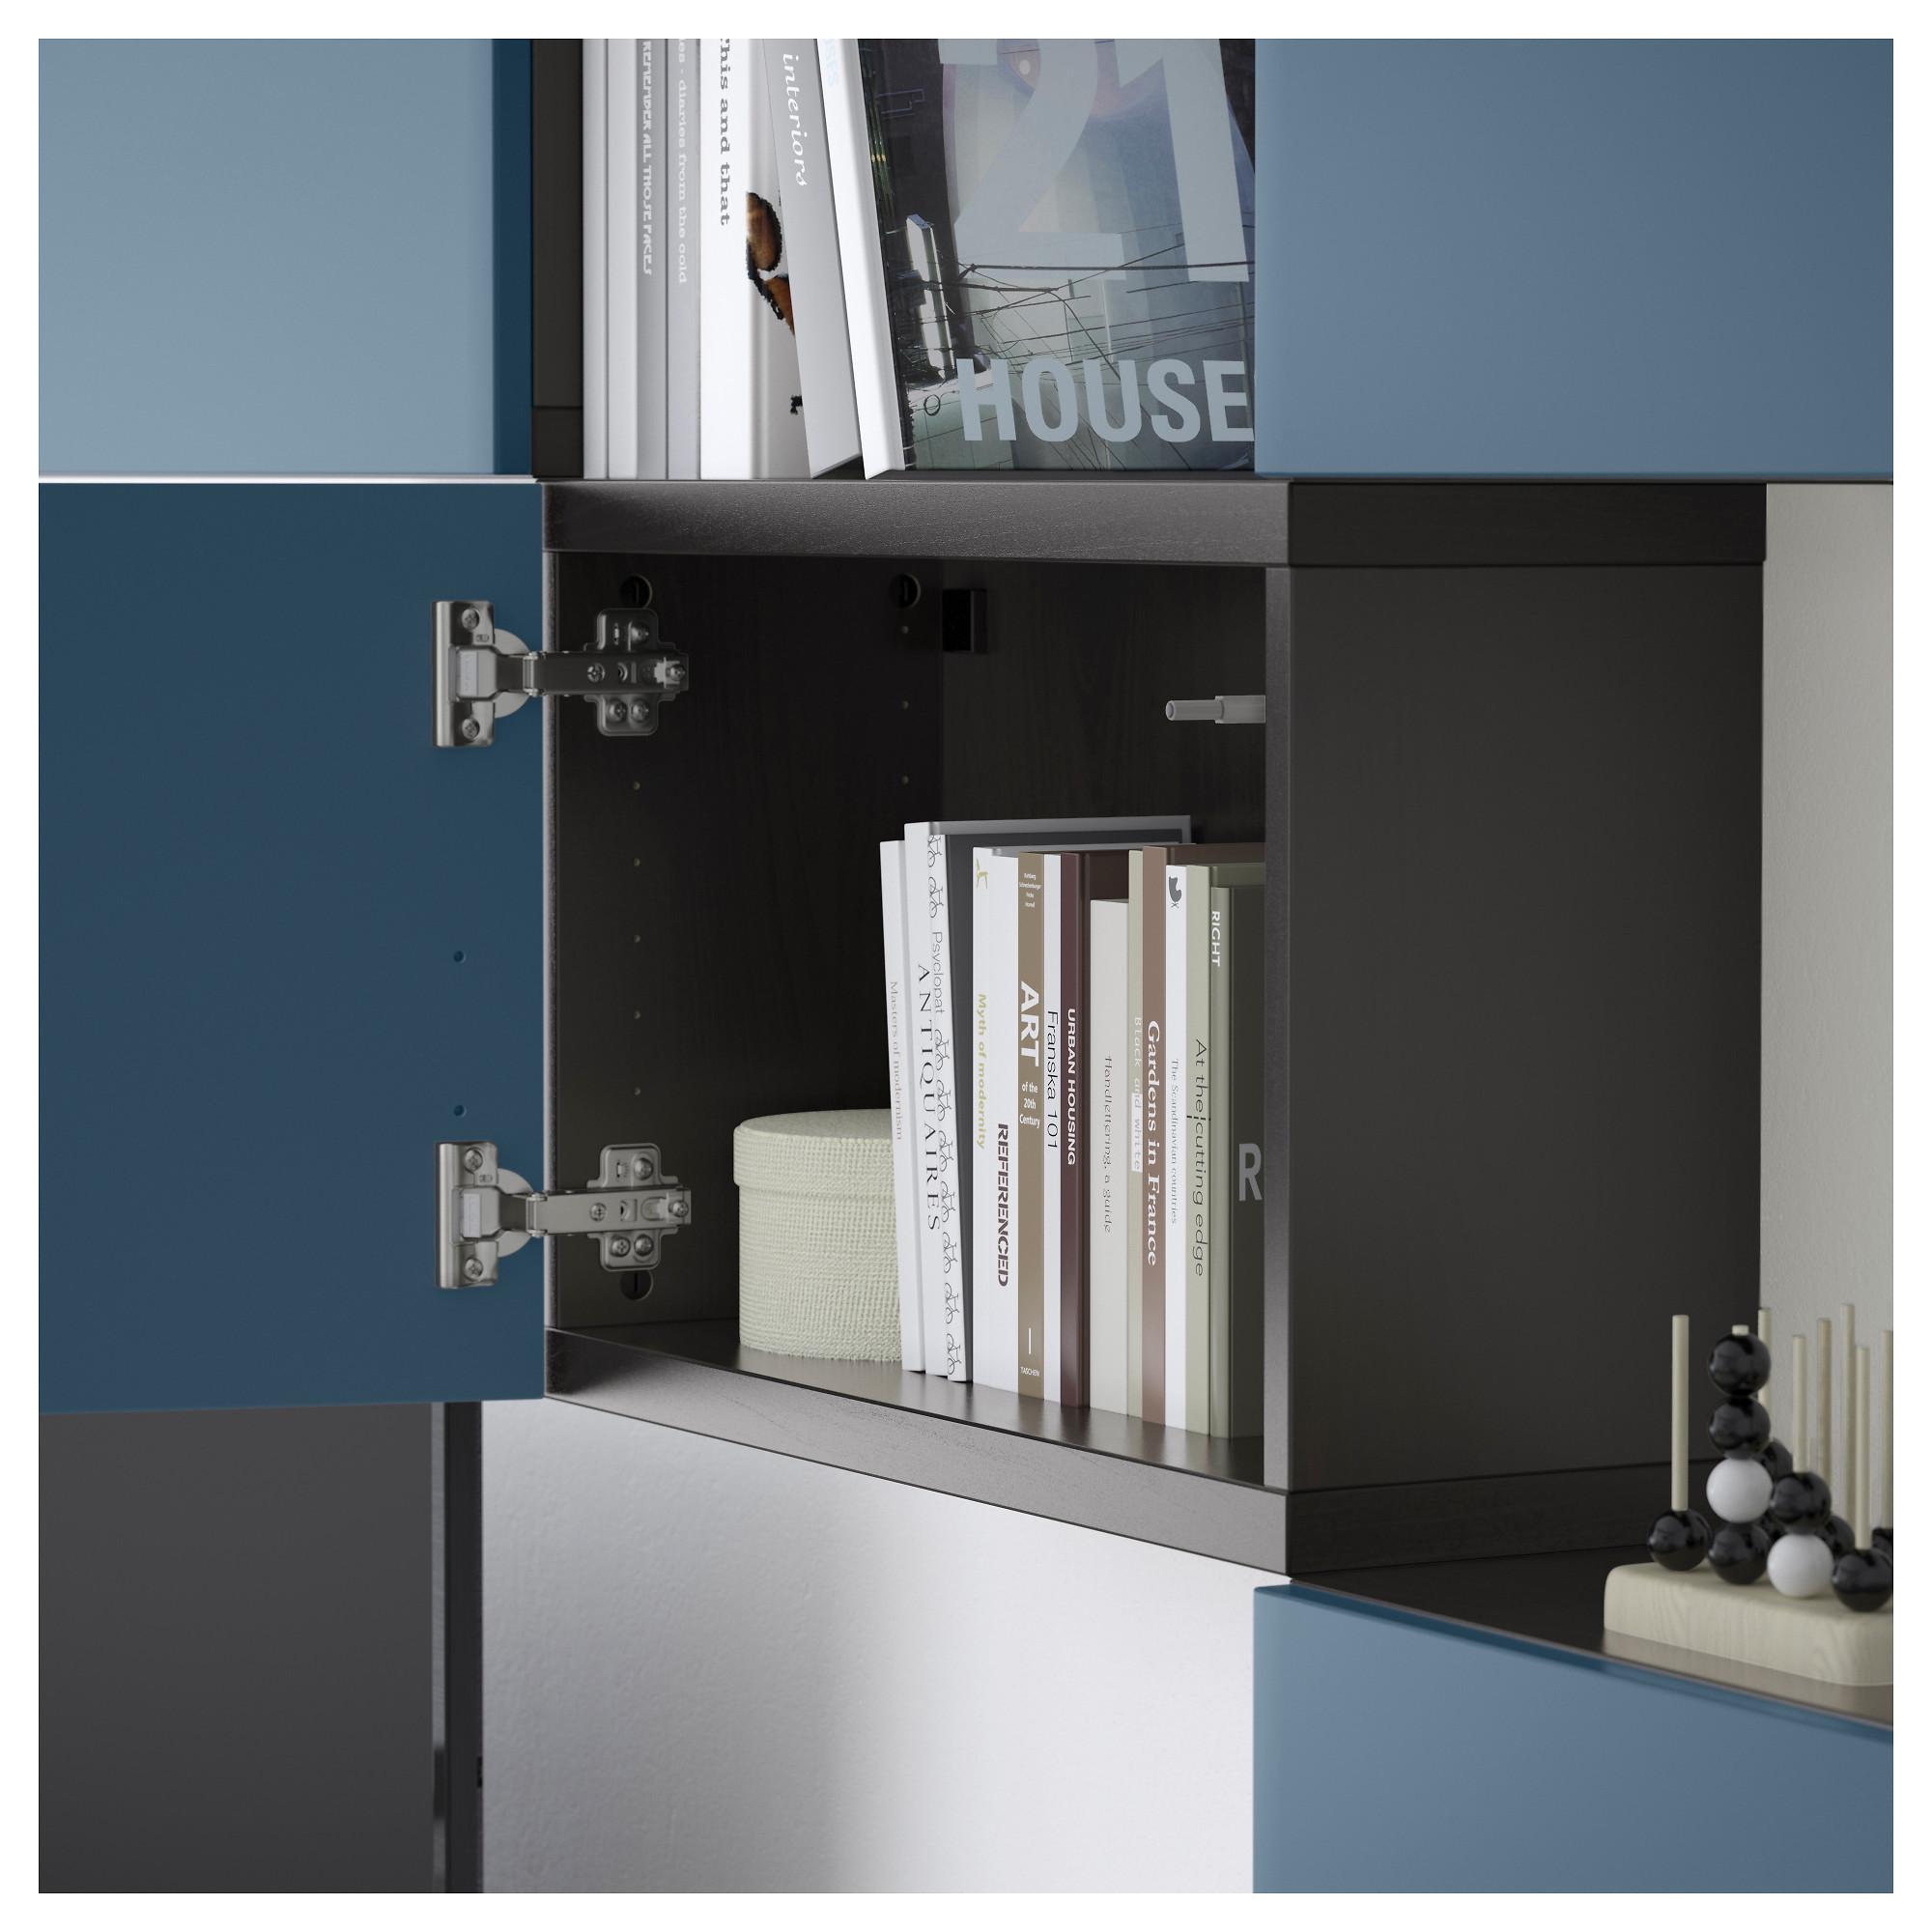 Шкаф для ТВ, комбинация БЕСТО темно-синий артикуль № 692.516.80 в наличии. Интернет каталог IKEA Минск. Недорогая доставка и монтаж.